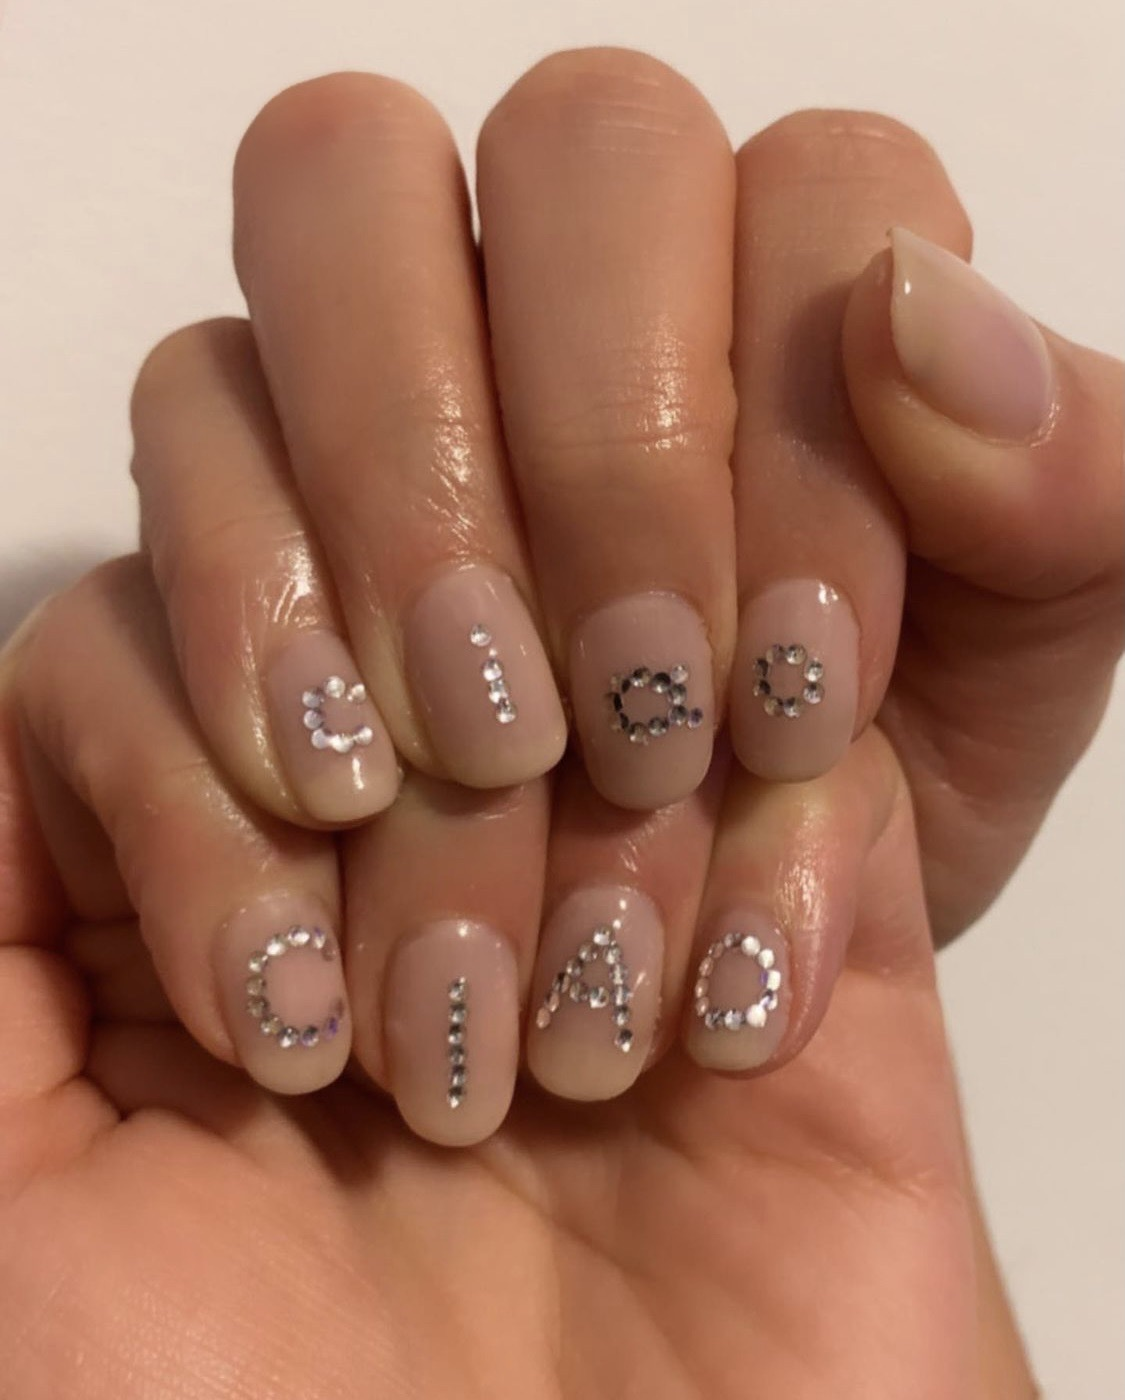 Manicura con mensaje de Nails by Mei.